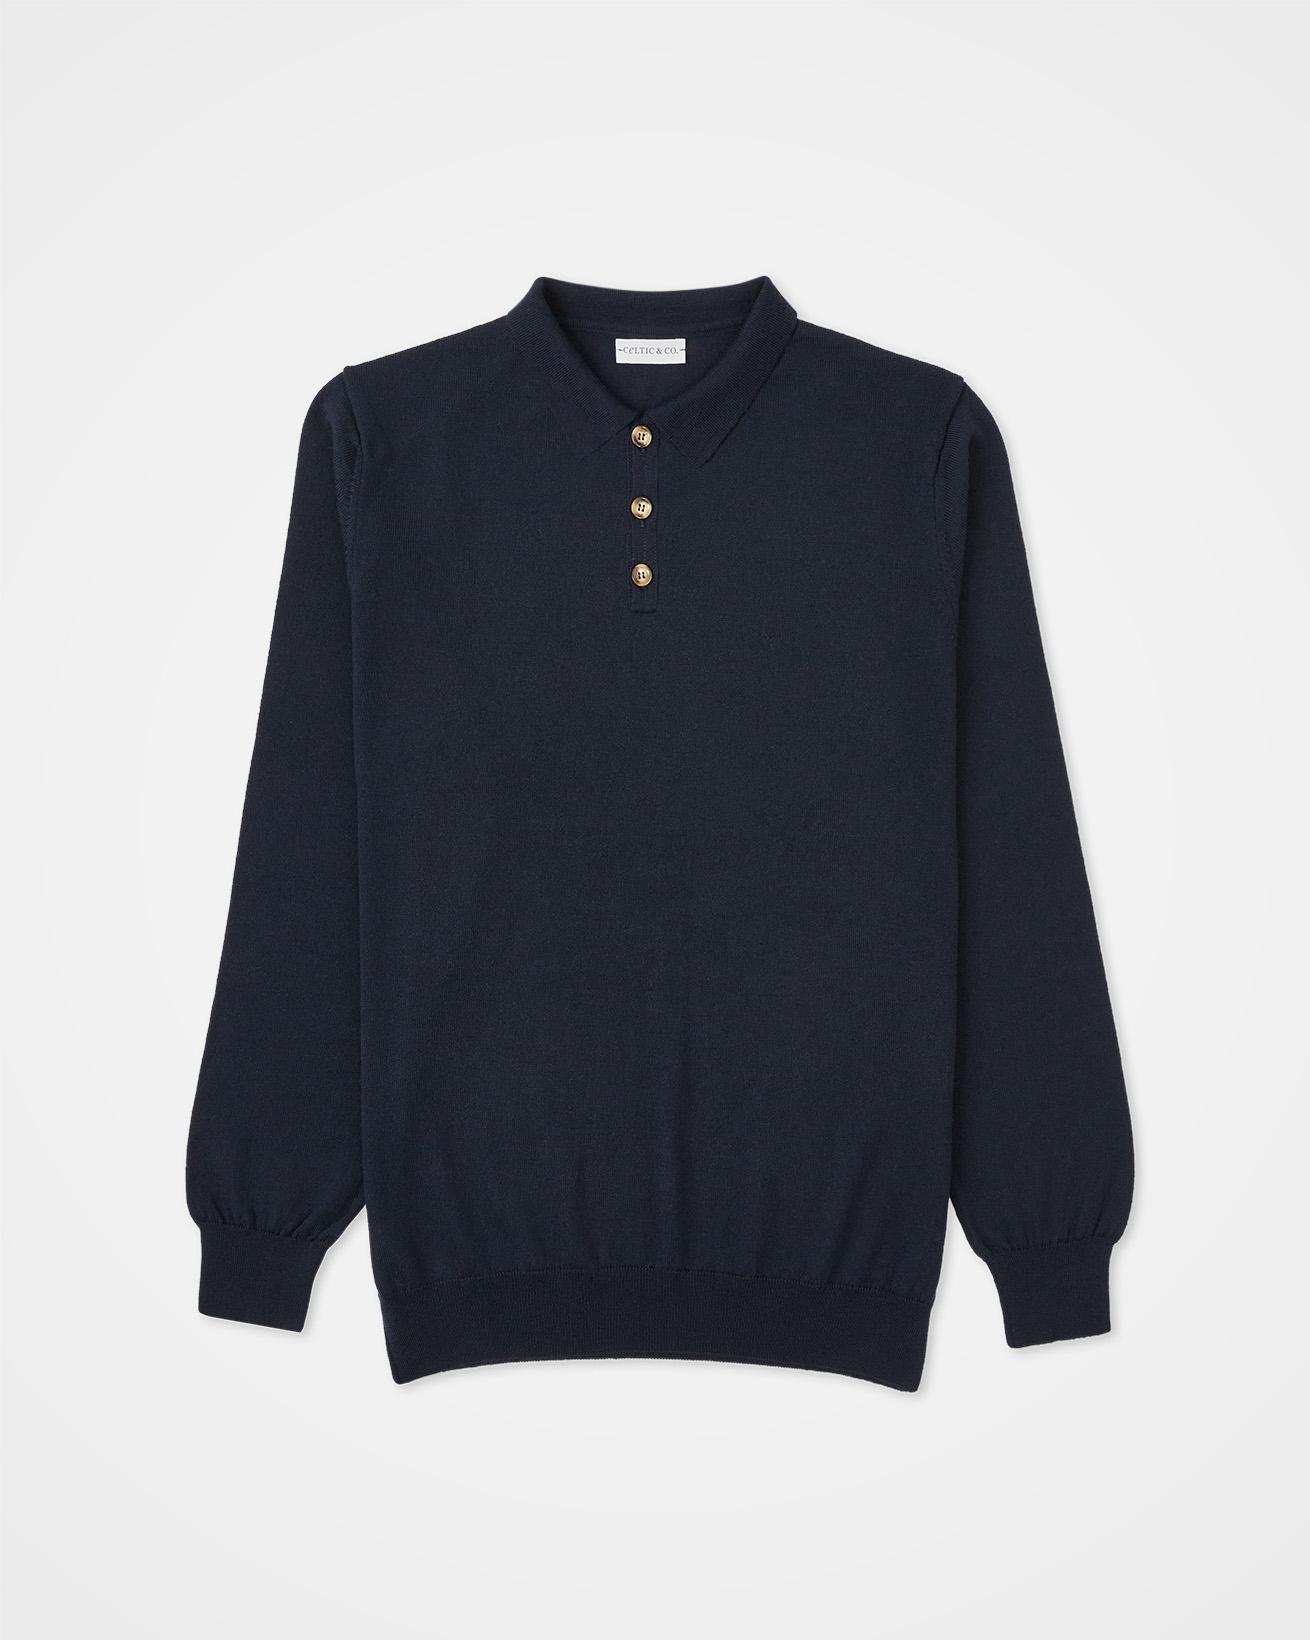 Men's Fine Knit Polo Sweater